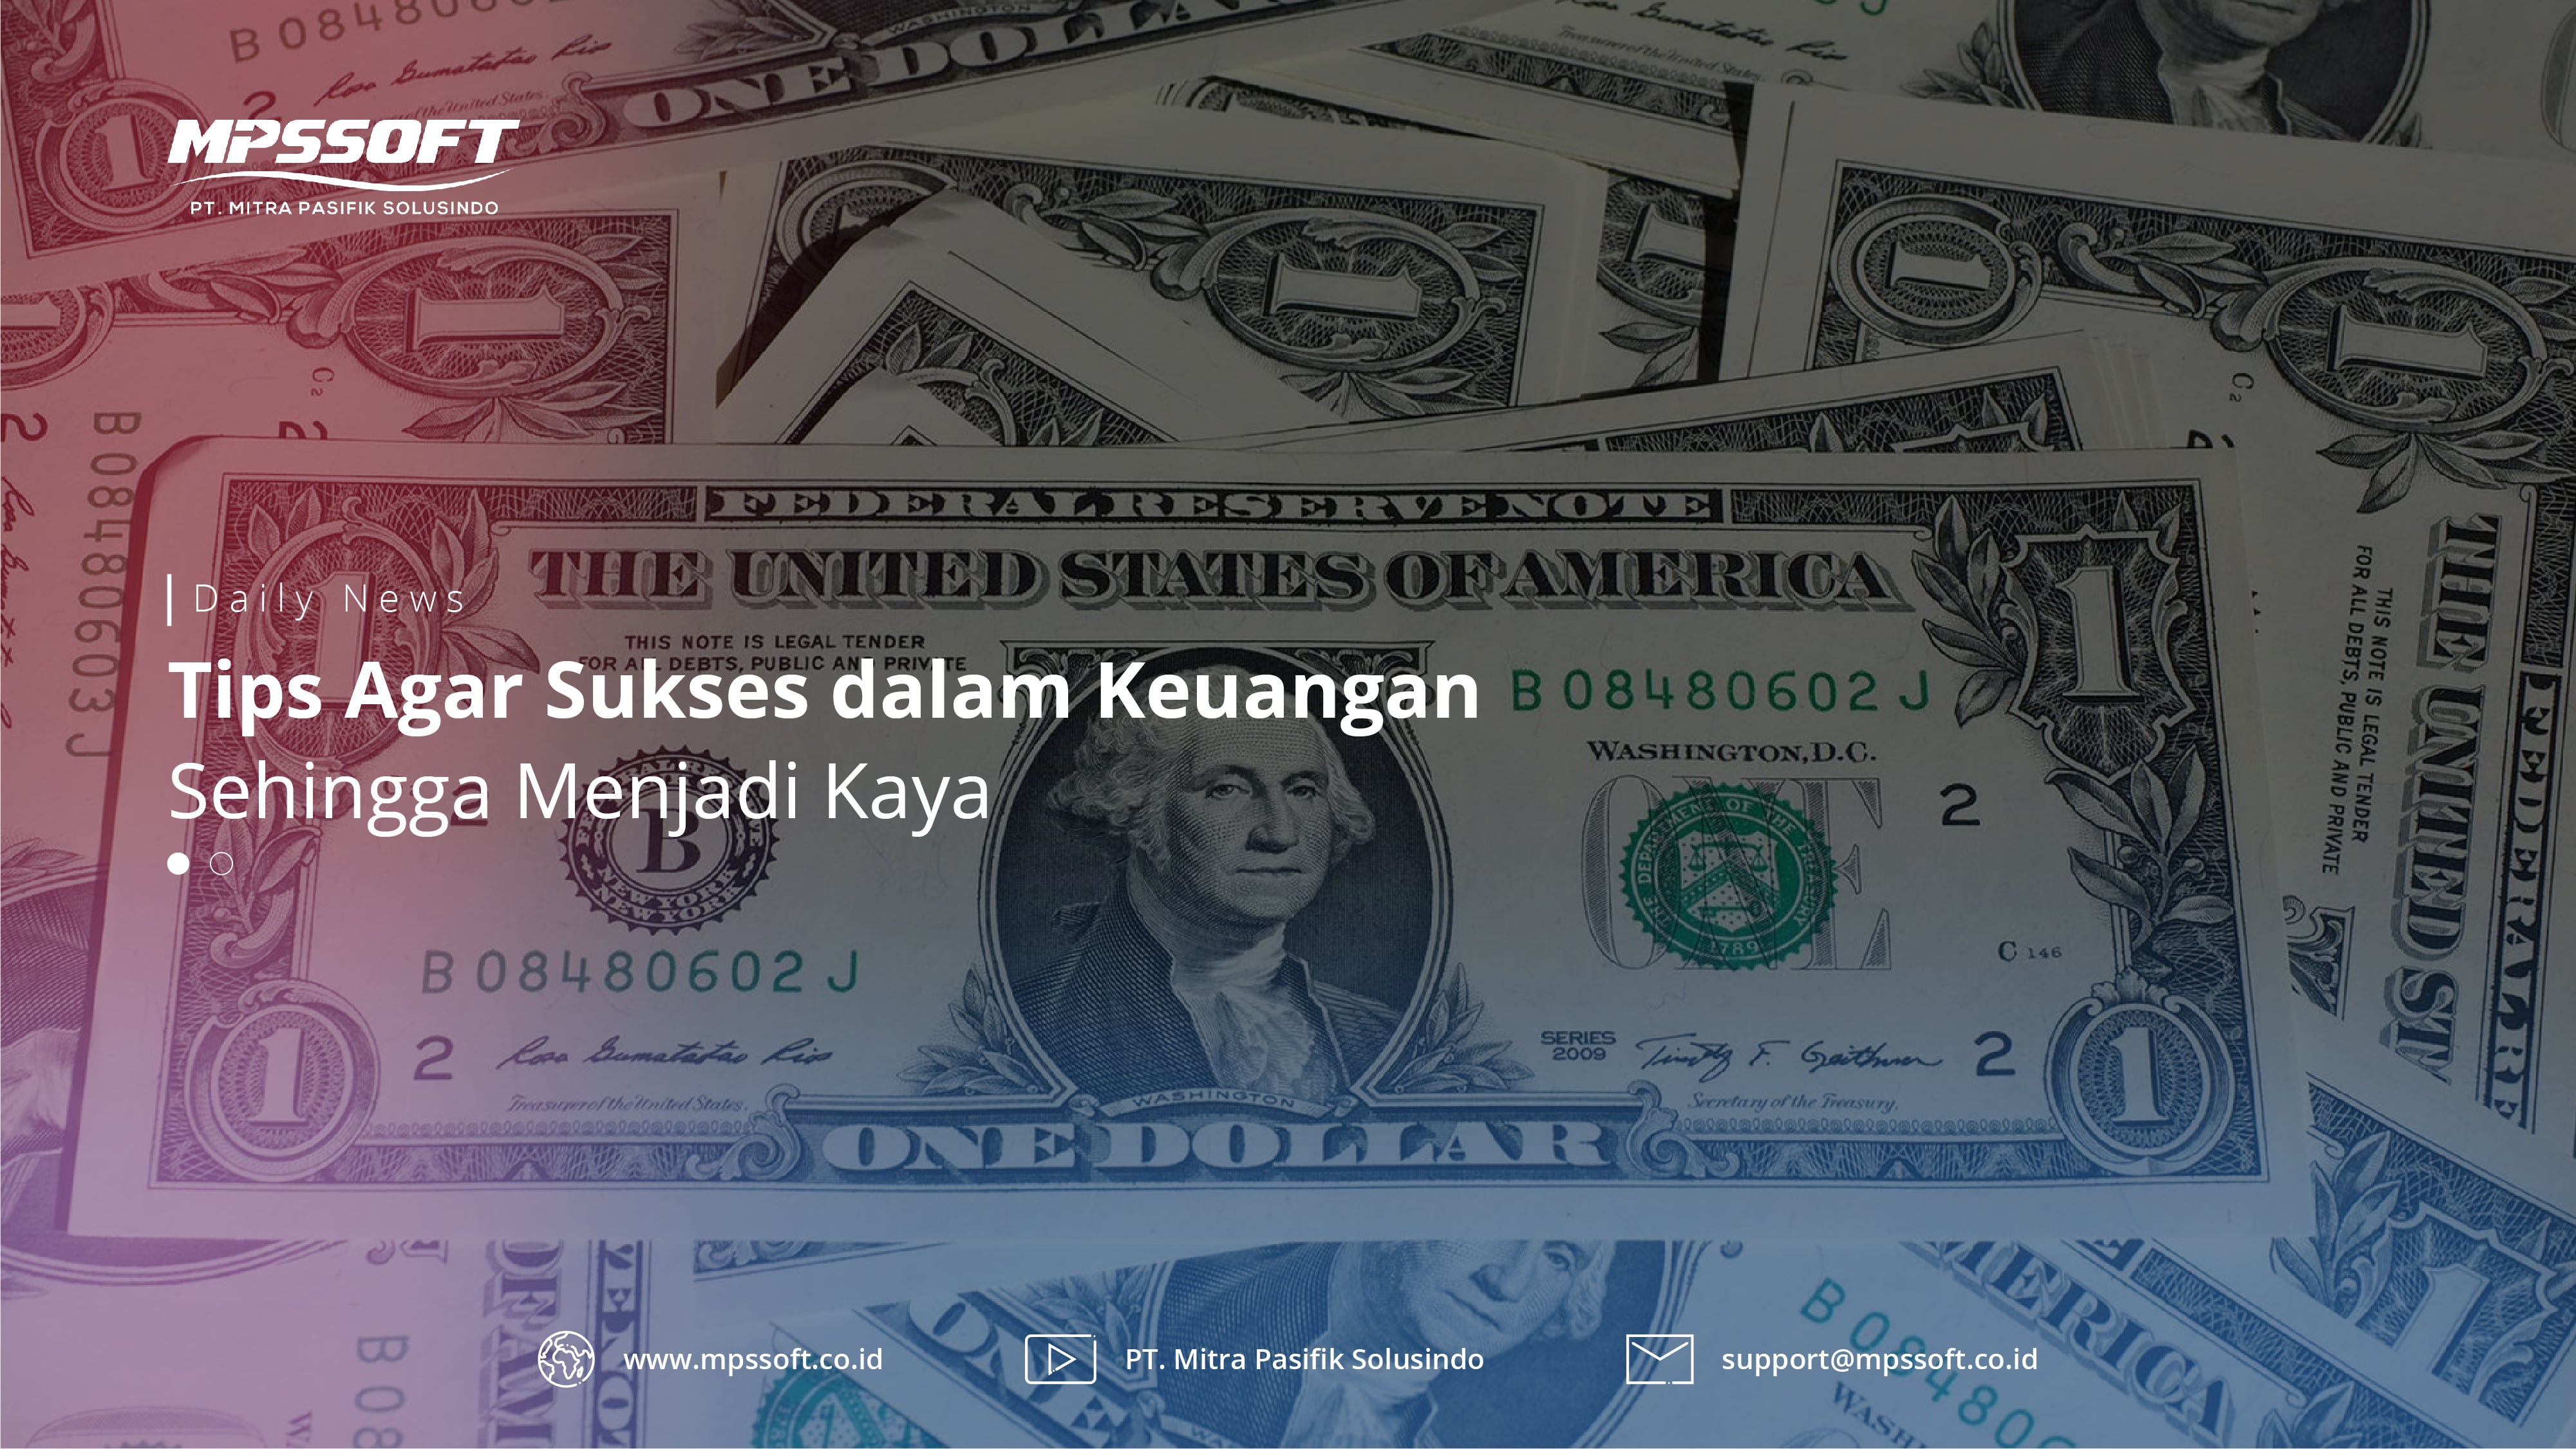 Tips Agar Sukses Dalam Keuangan Sehingga Menjadi Kaya